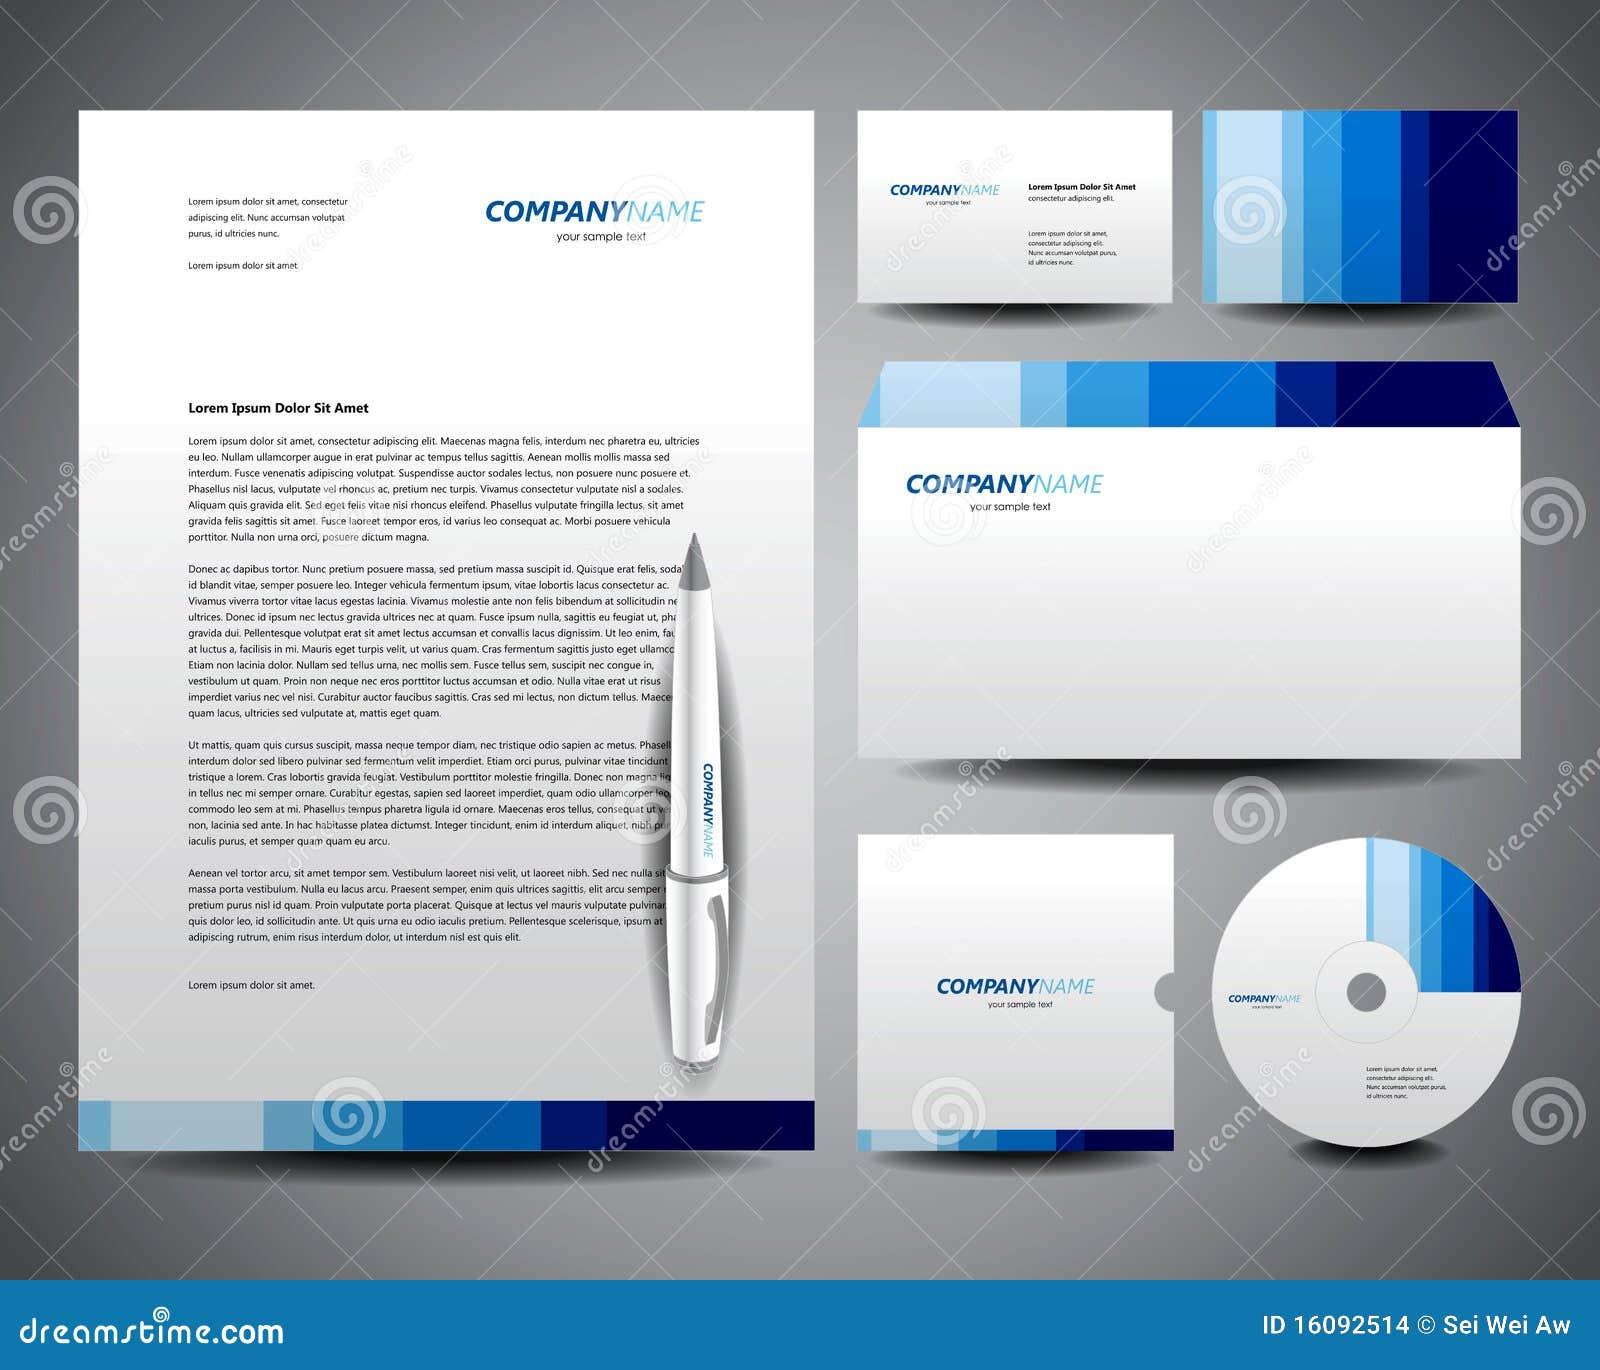 Sample business letterhead templates